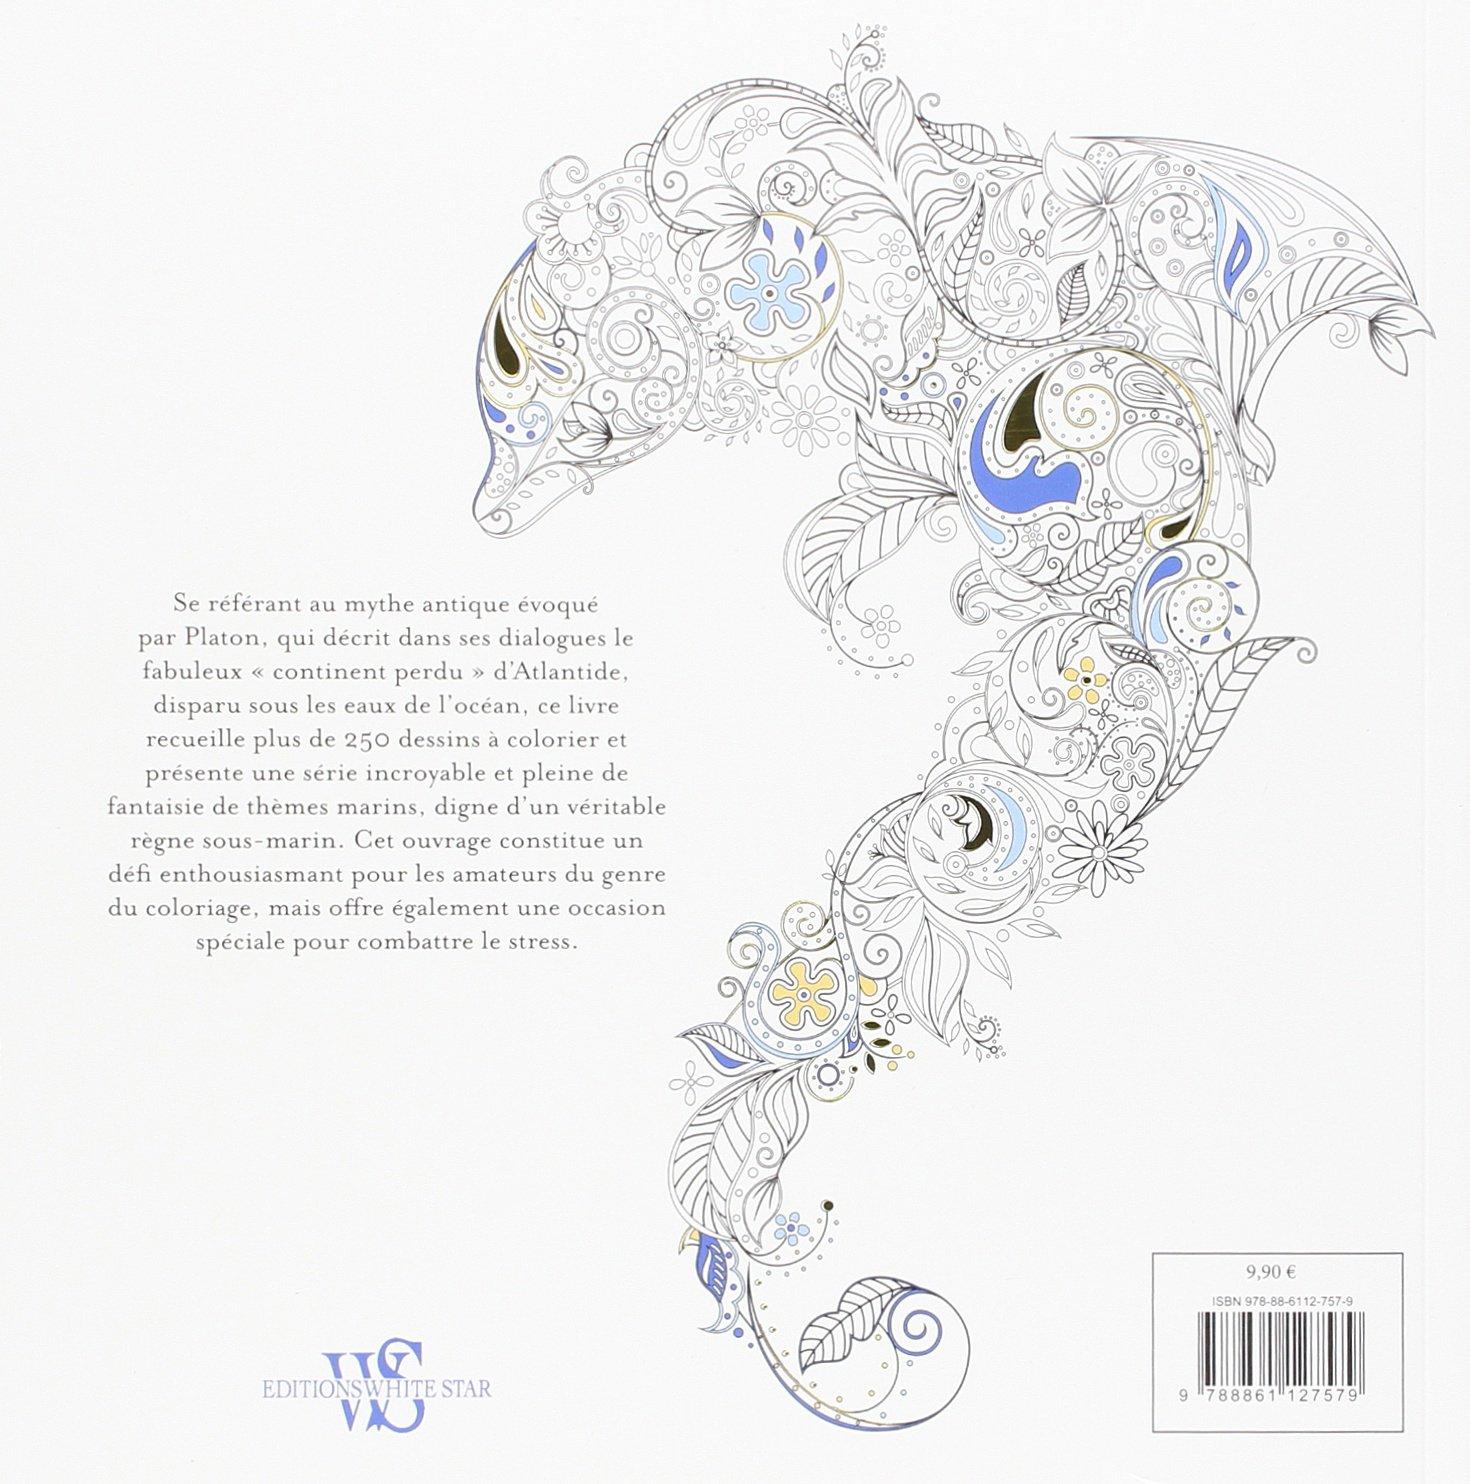 atlantide - dessins à colorier anti-stress